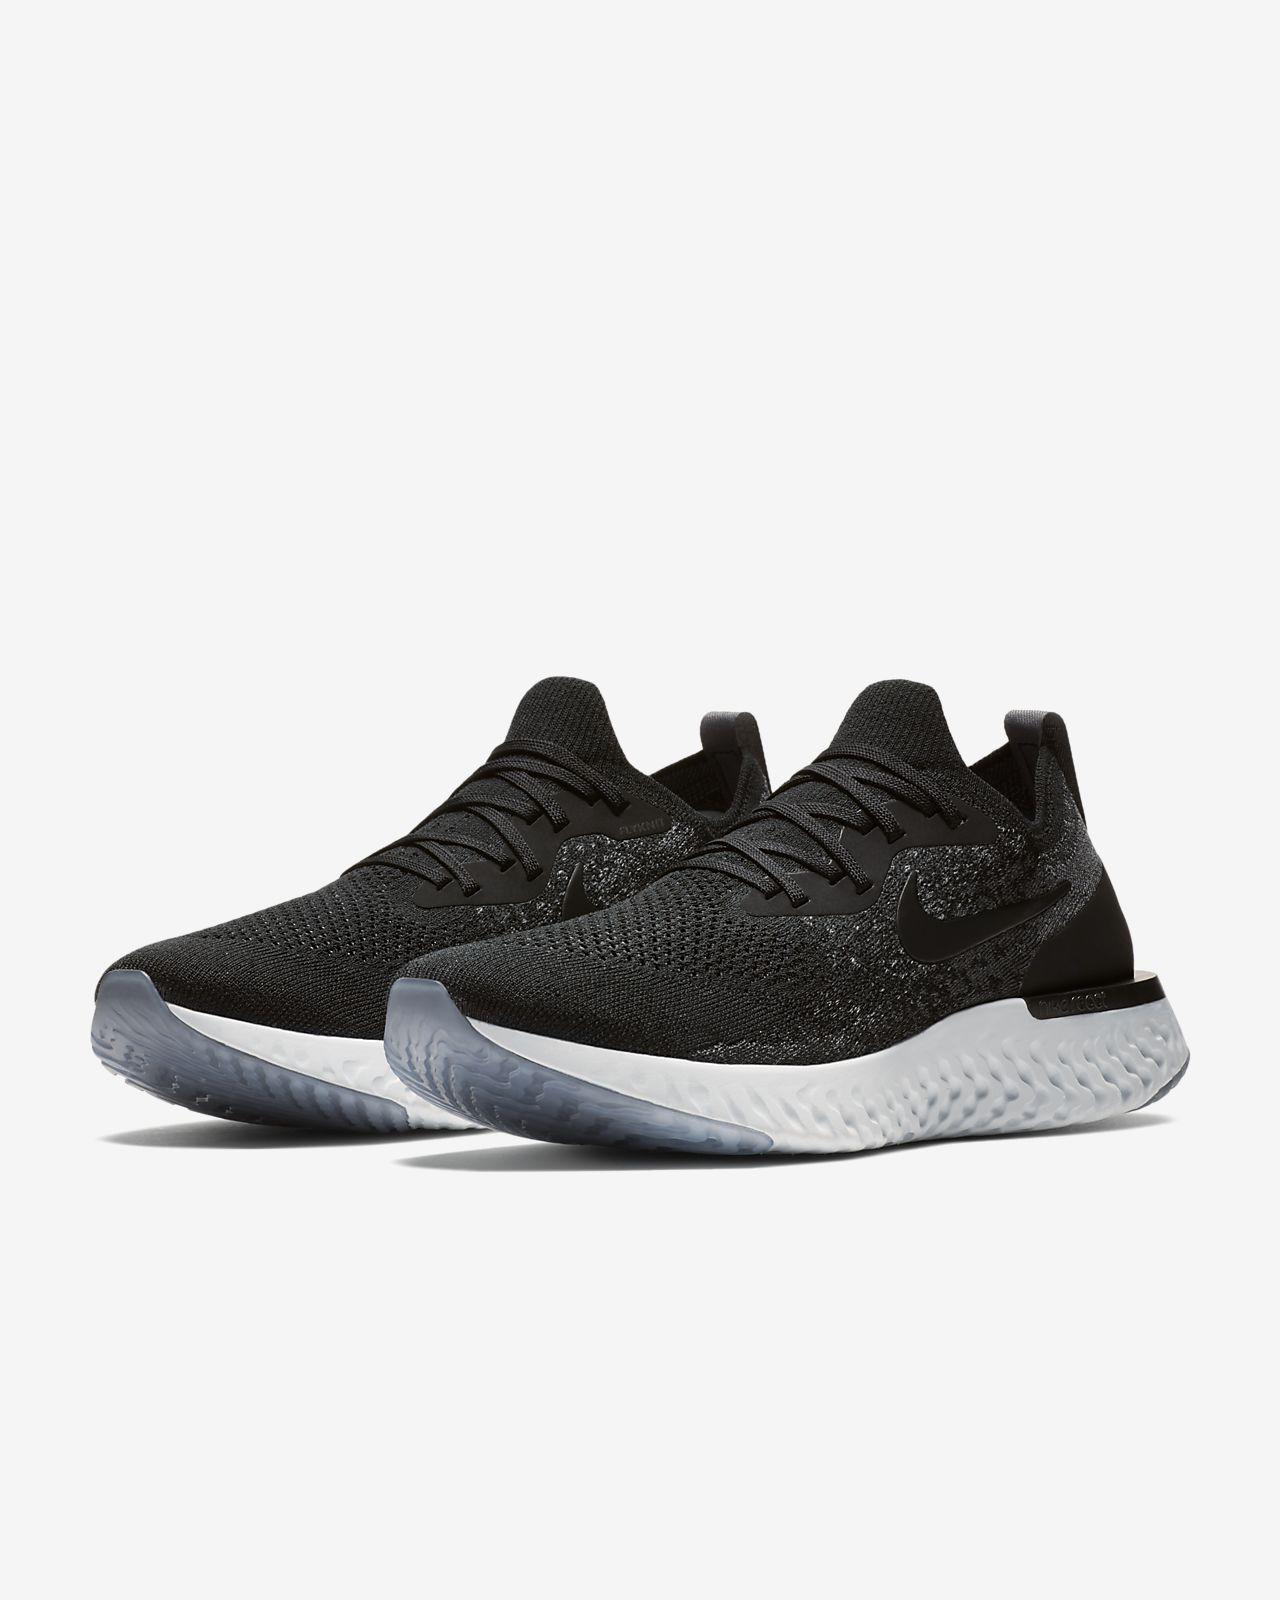 Nike Épique Réagir Flyknit HOK3LpdM5